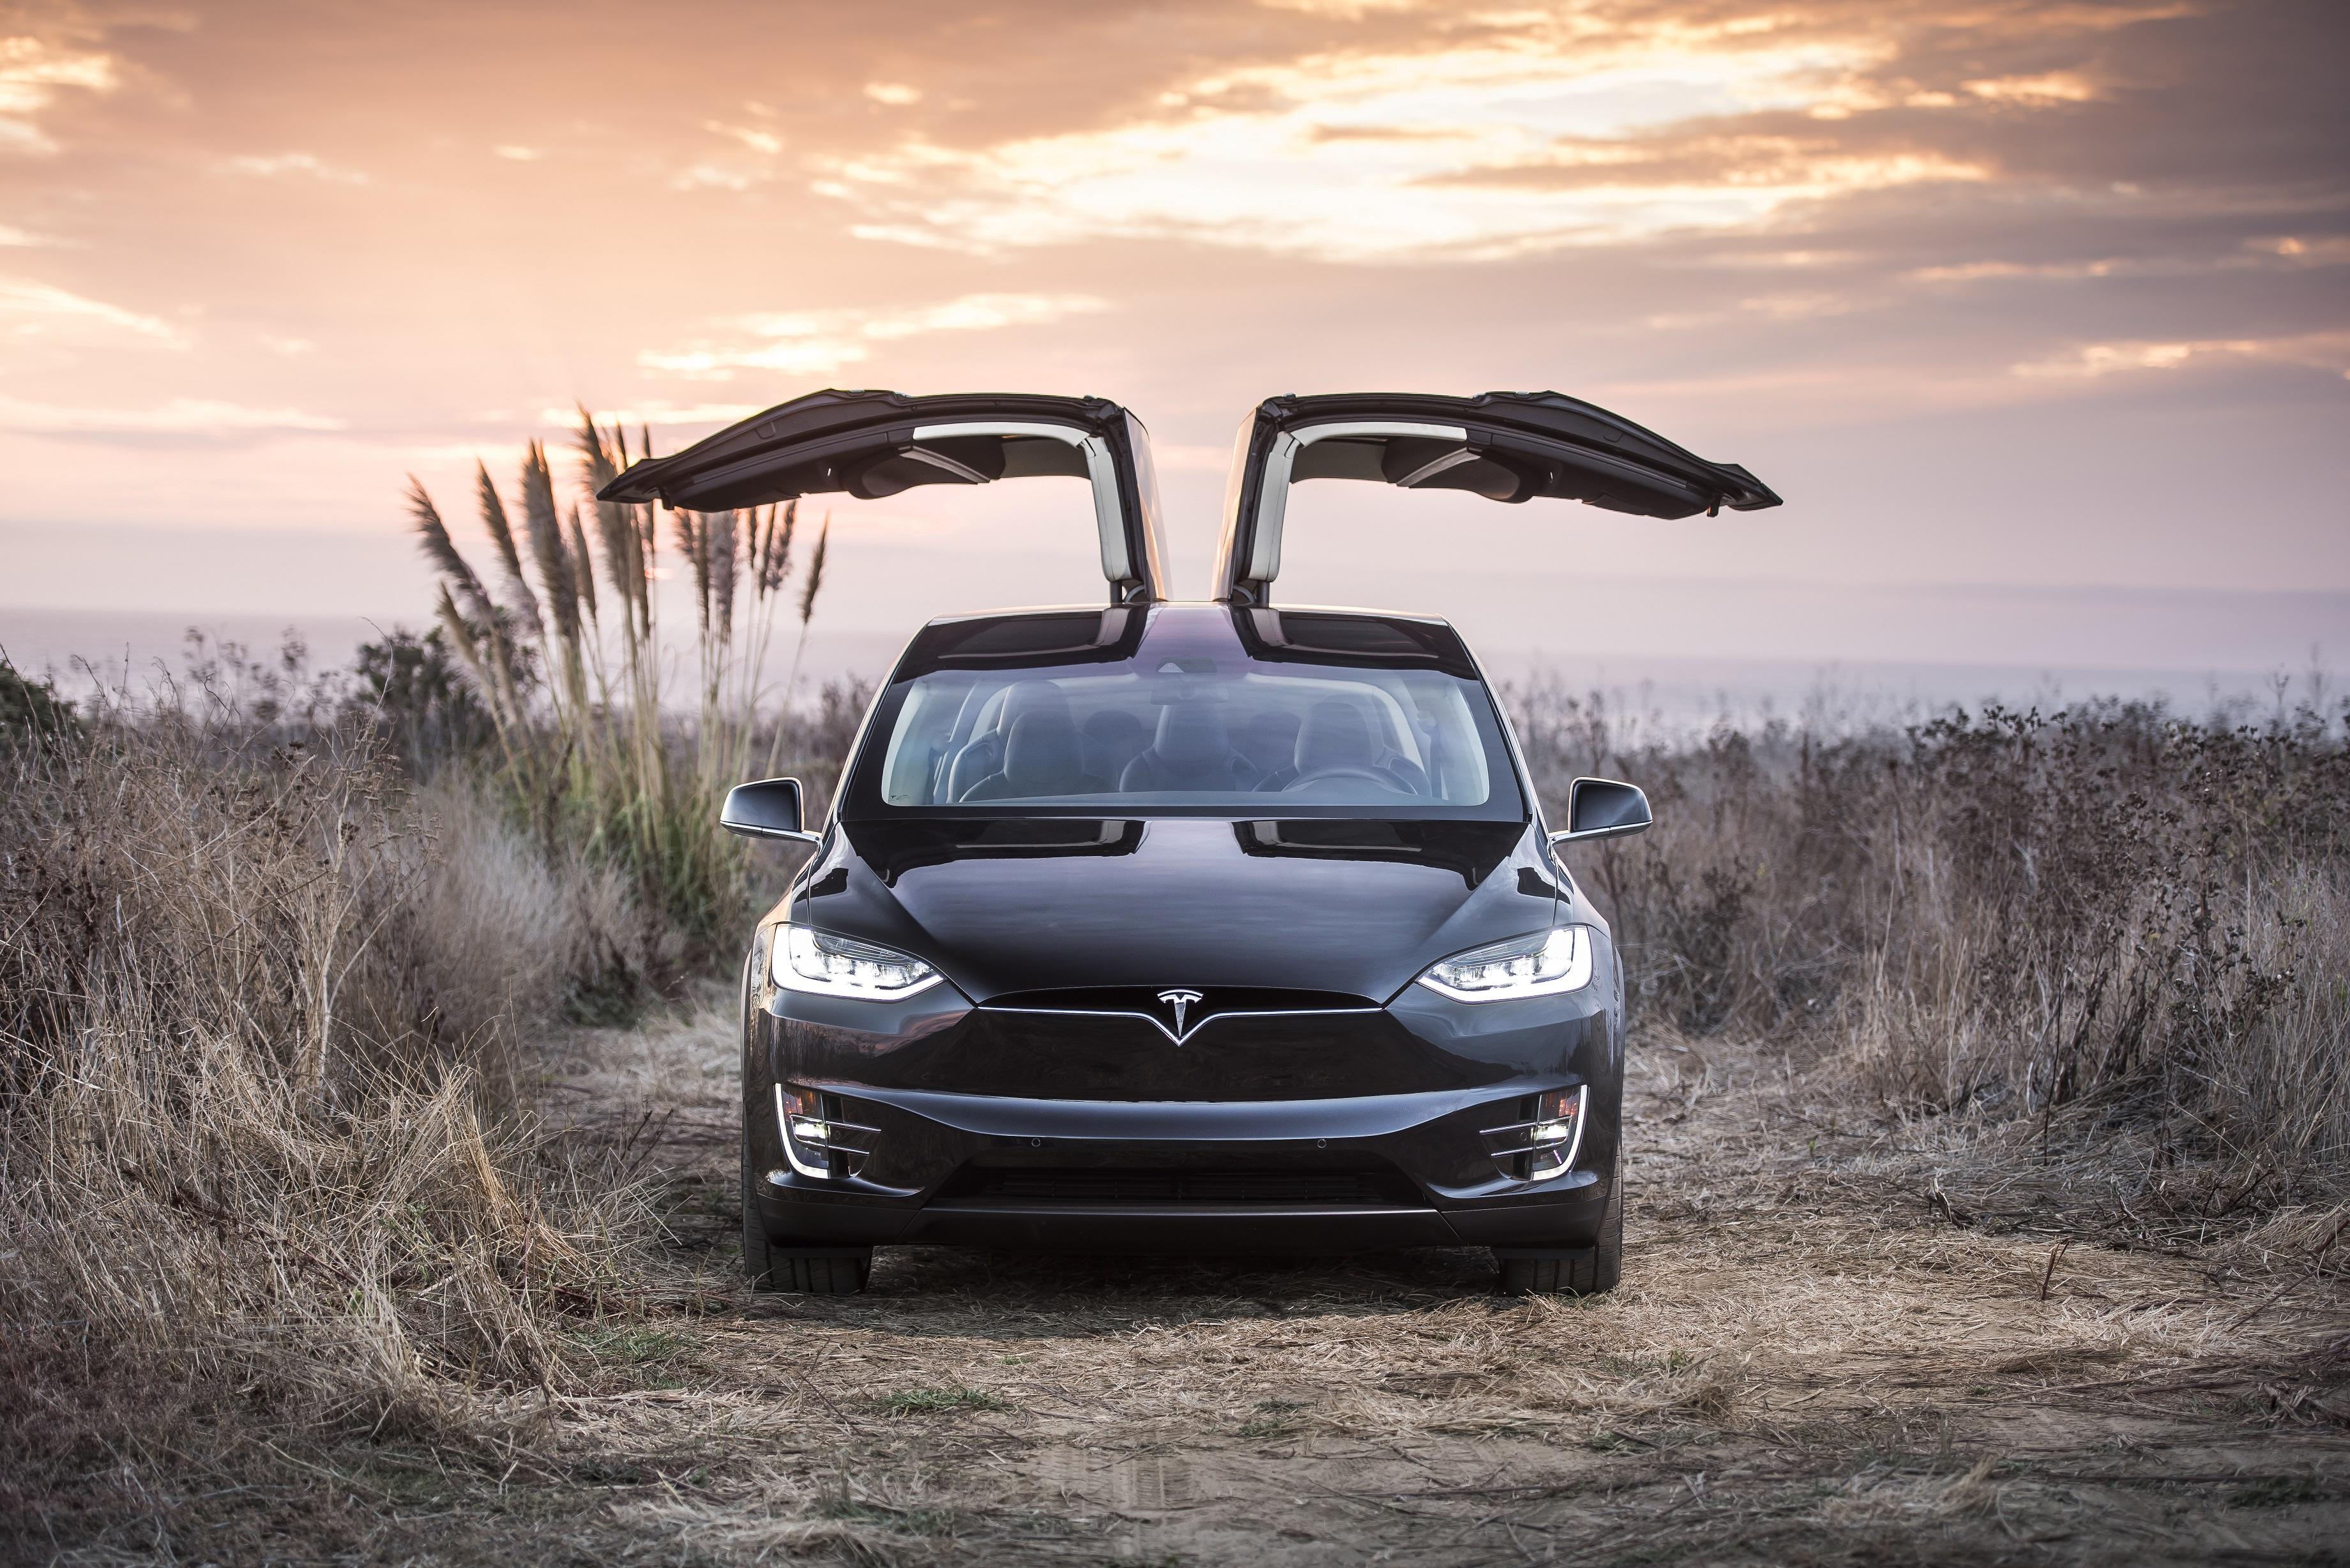 Tesla tapte over 2,4 milliarder norske kroner i løpet av årets andre kvartal.